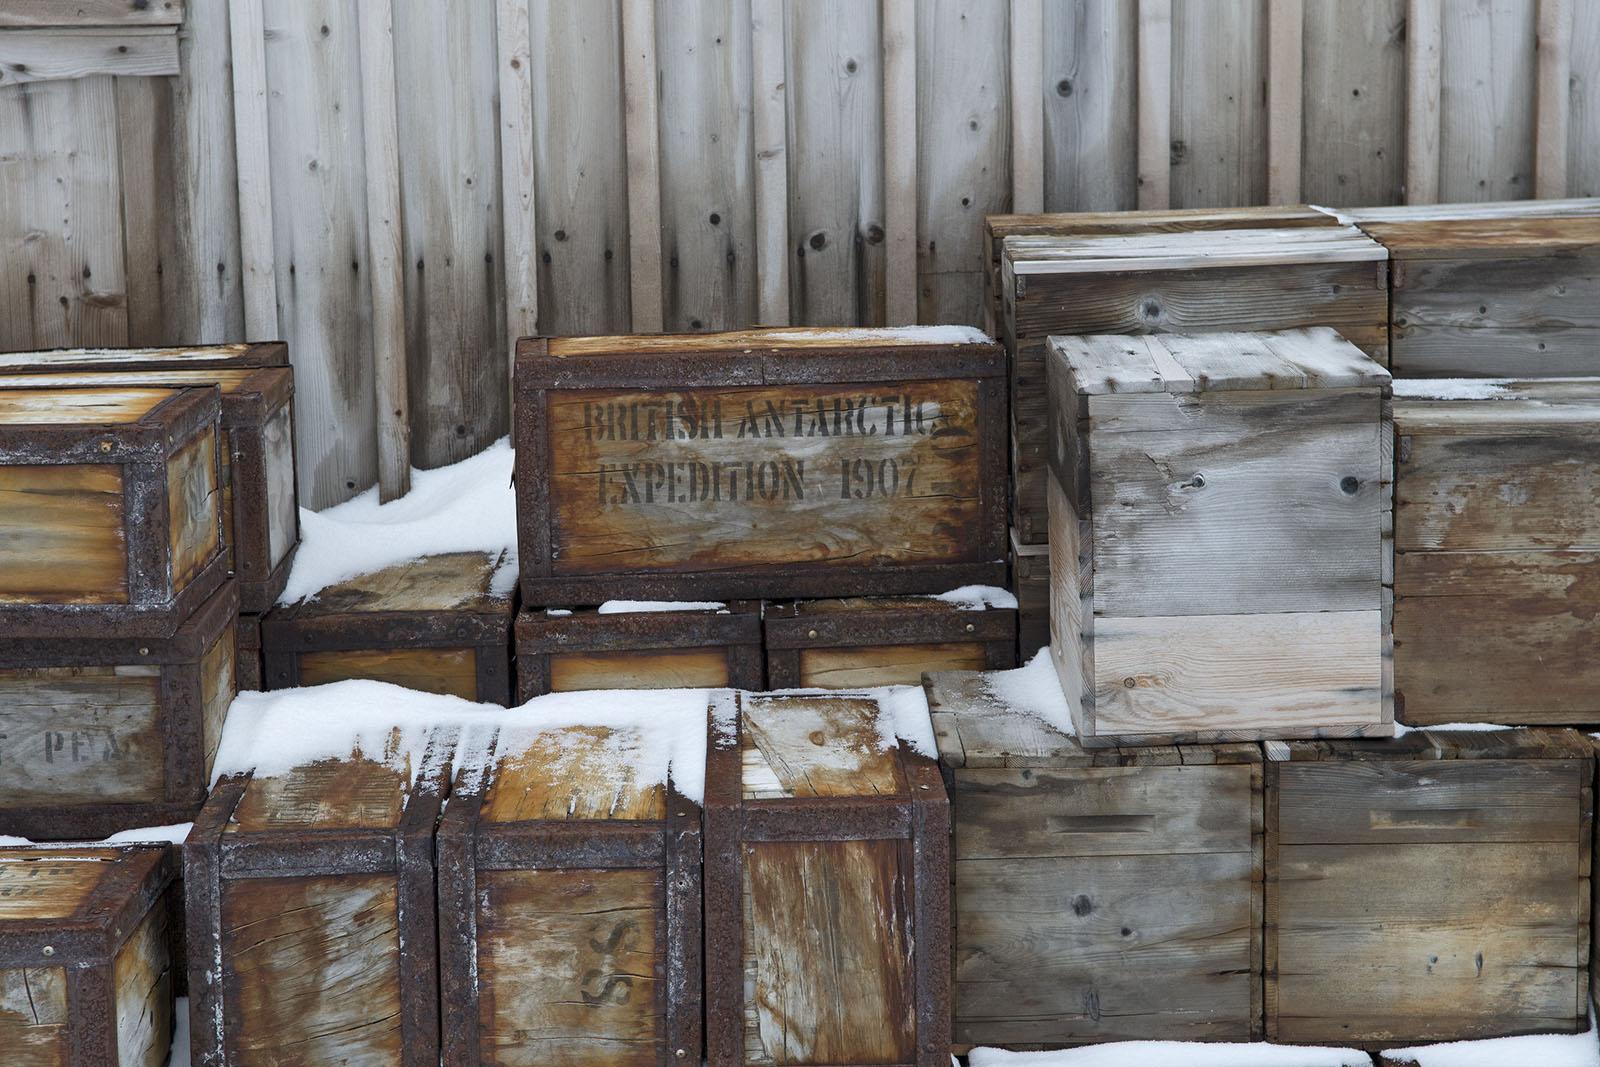 British Antarctic Expedition Box 2014 16×24 © L'Heureux